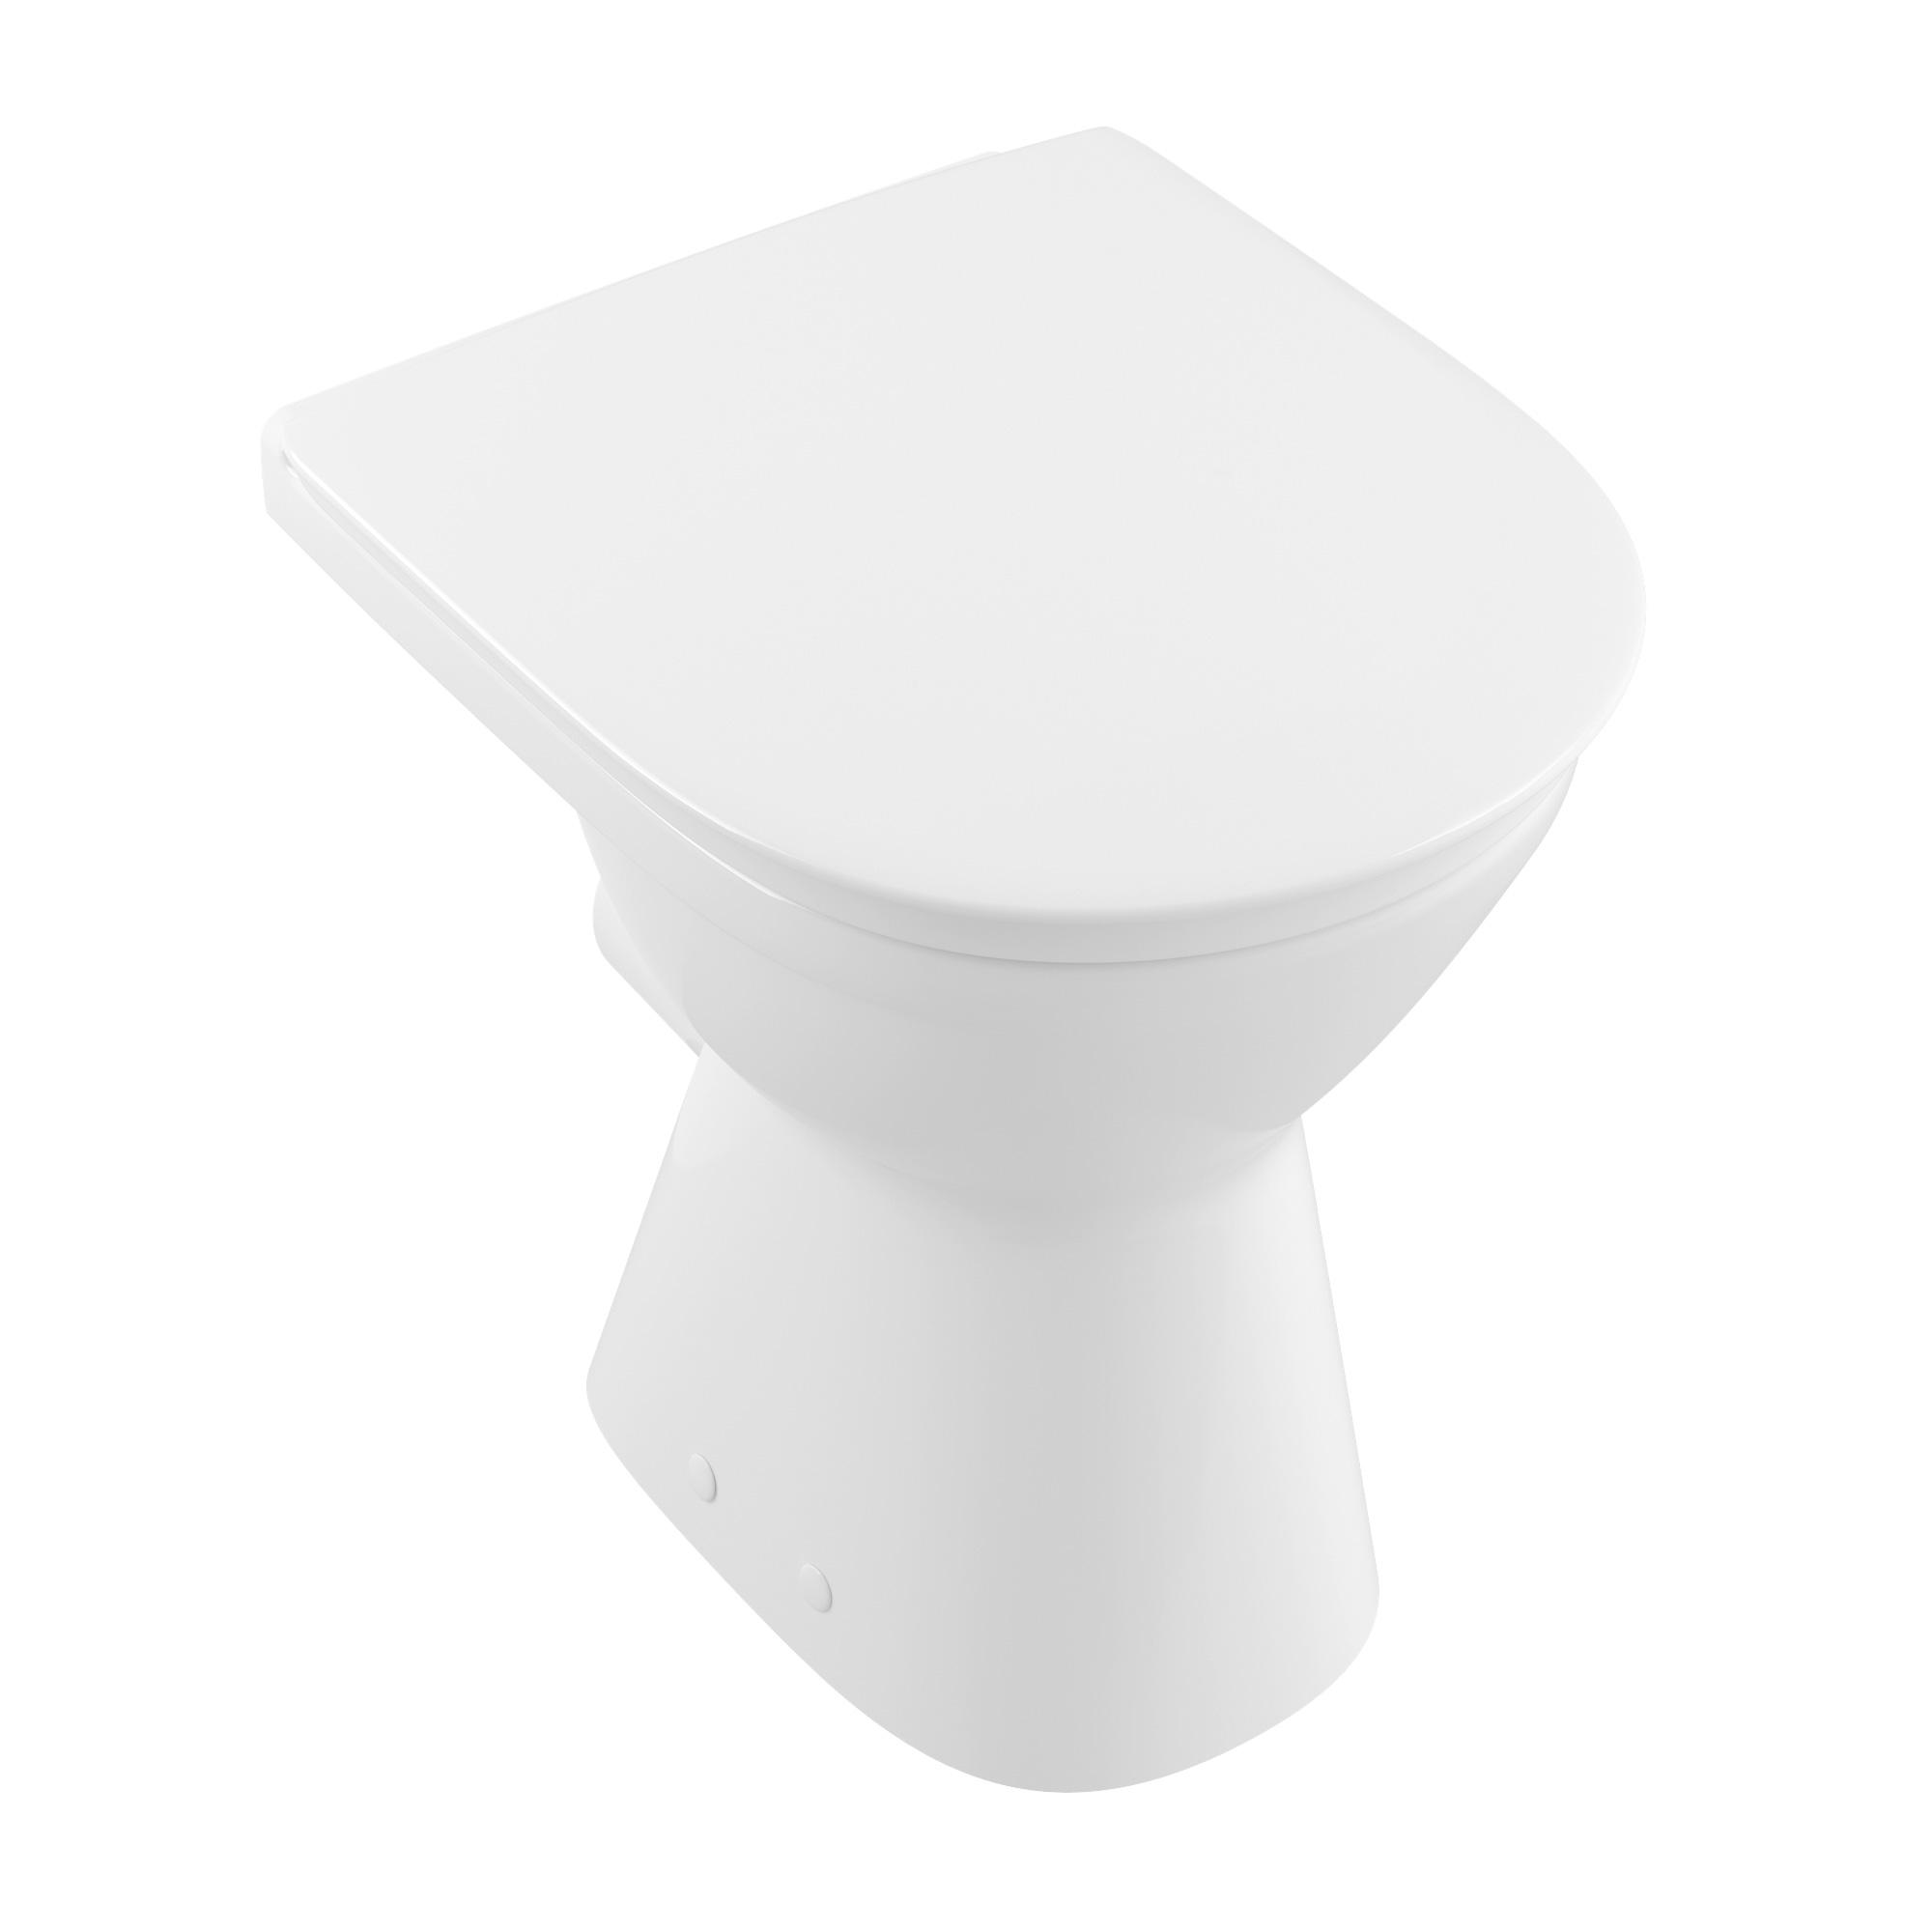 villeroy boch stand tiefsp l wc vita l 49 b 36 cm wei mit ceramicplus 468310r1. Black Bedroom Furniture Sets. Home Design Ideas